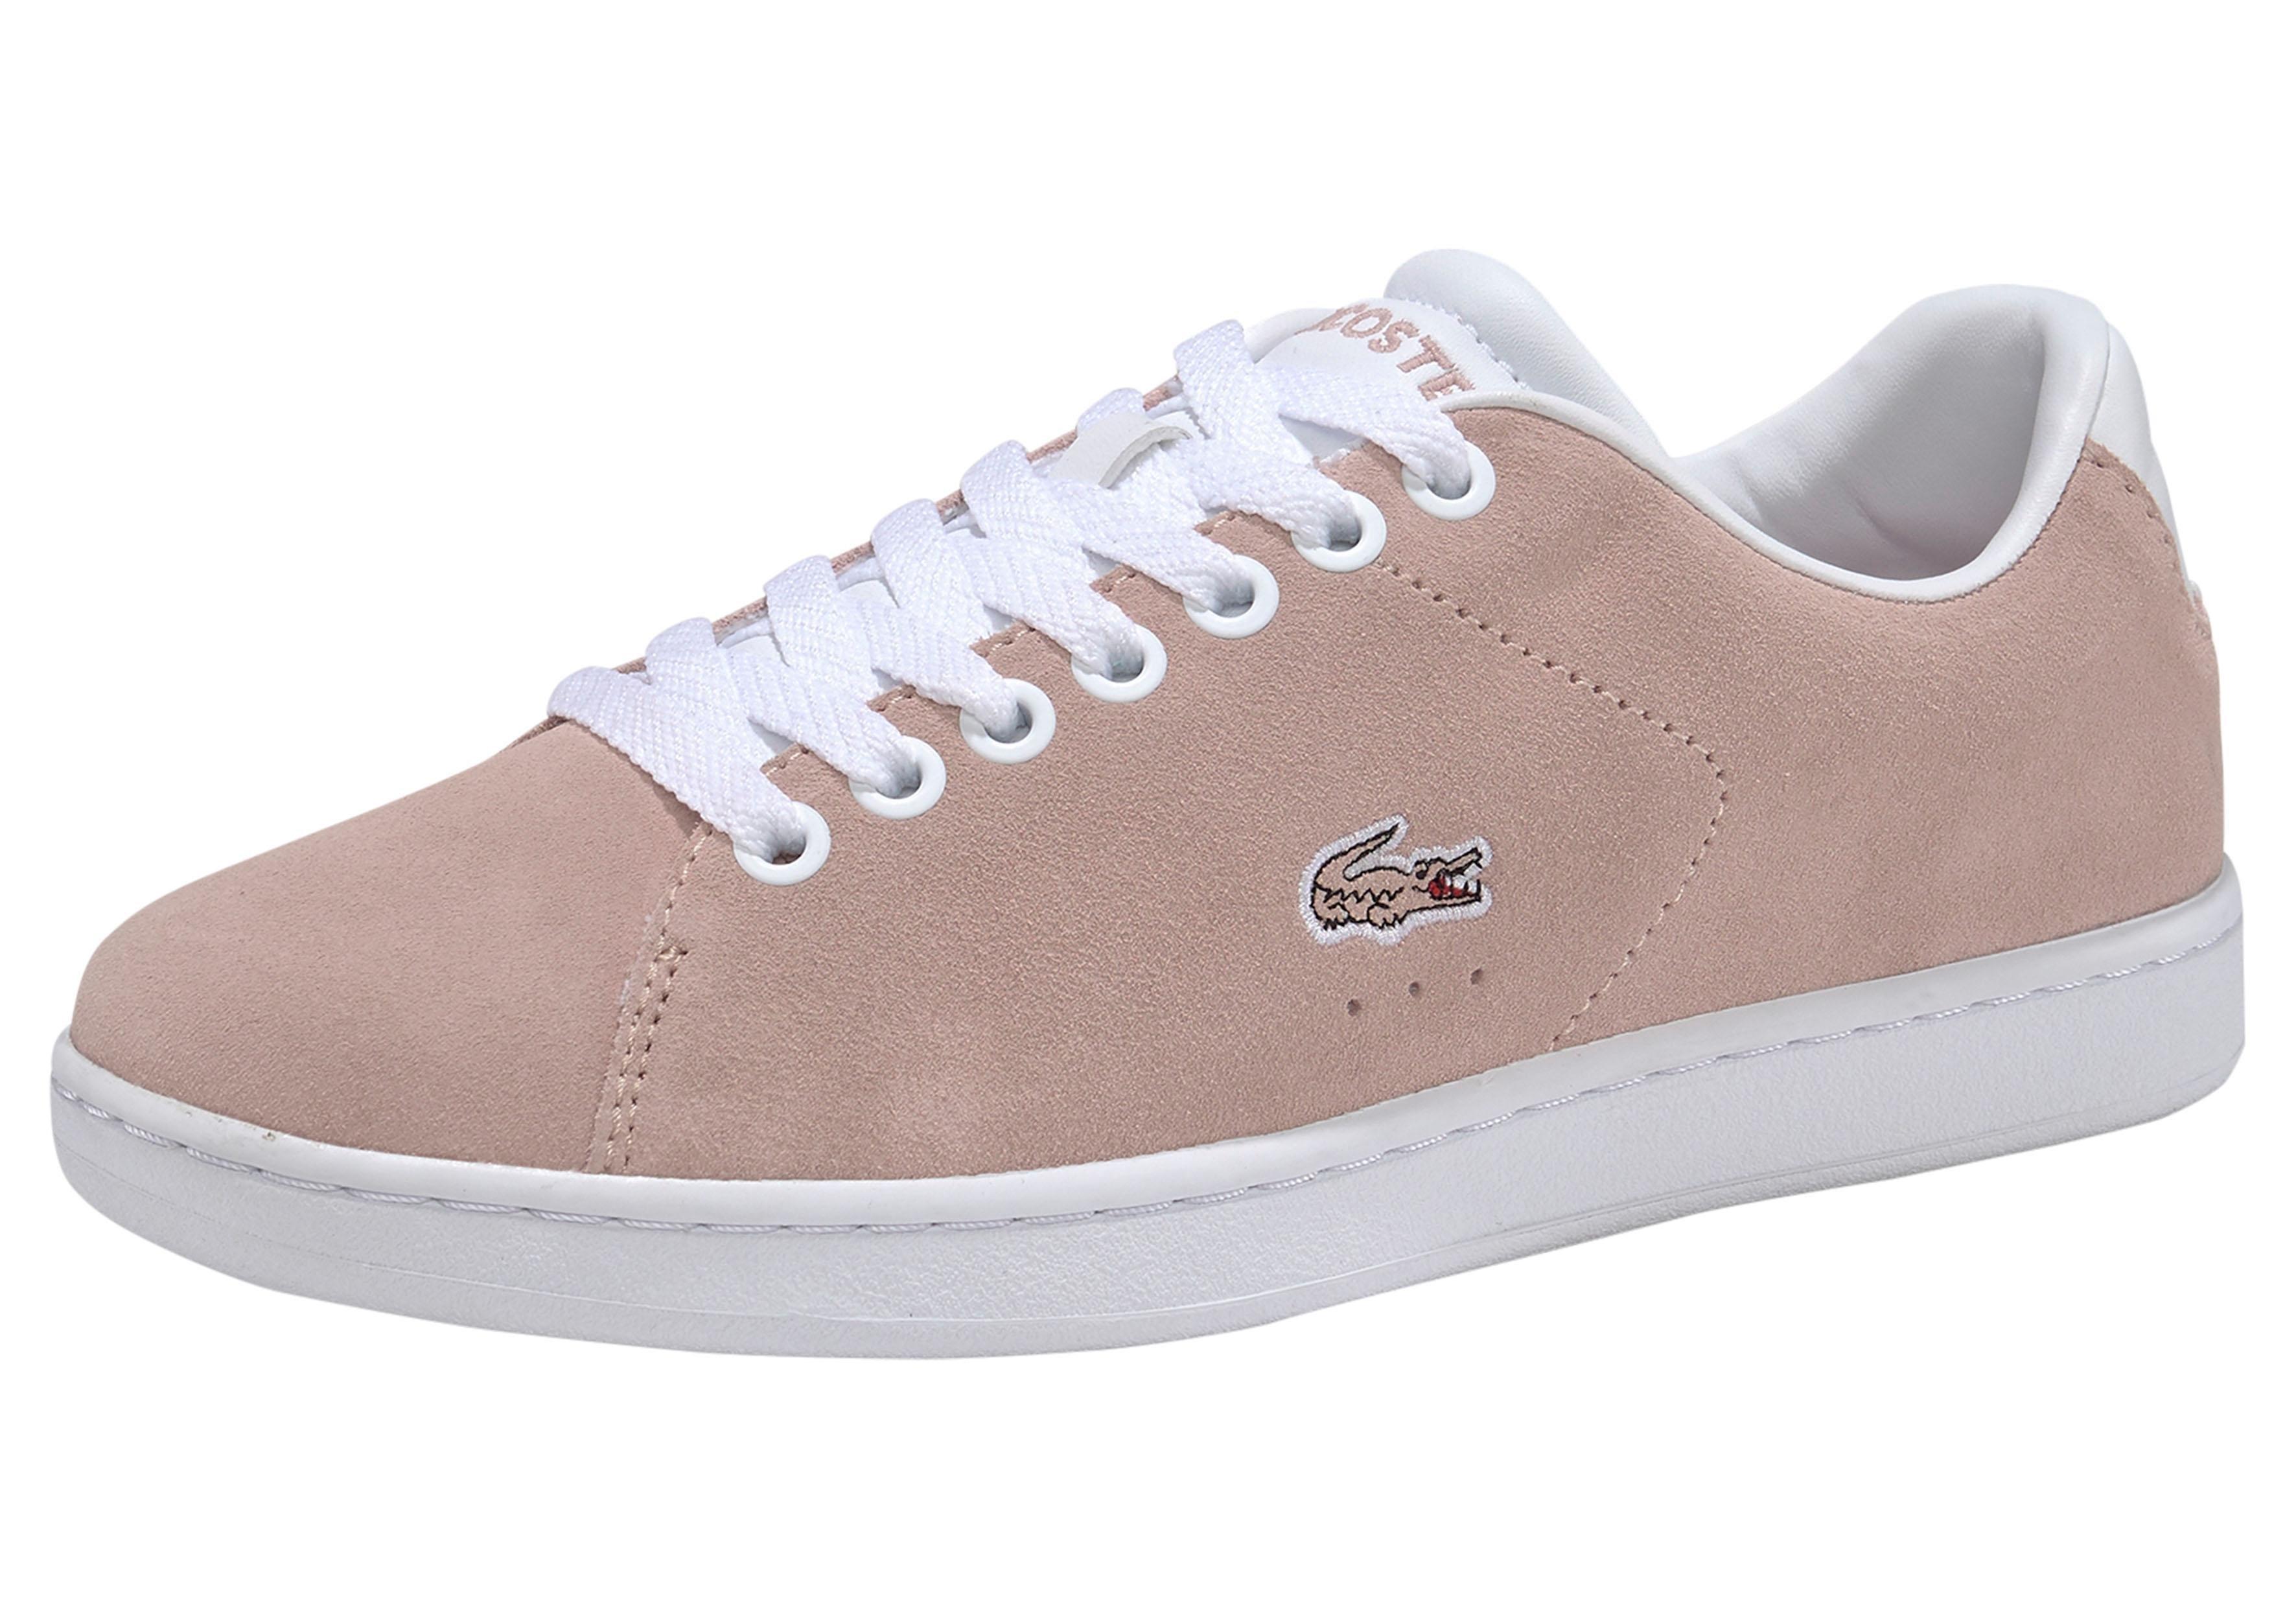 LACOSTE sneakers »CARNABY EVO 120 5 SFA« in de webshop van OTTO kopen